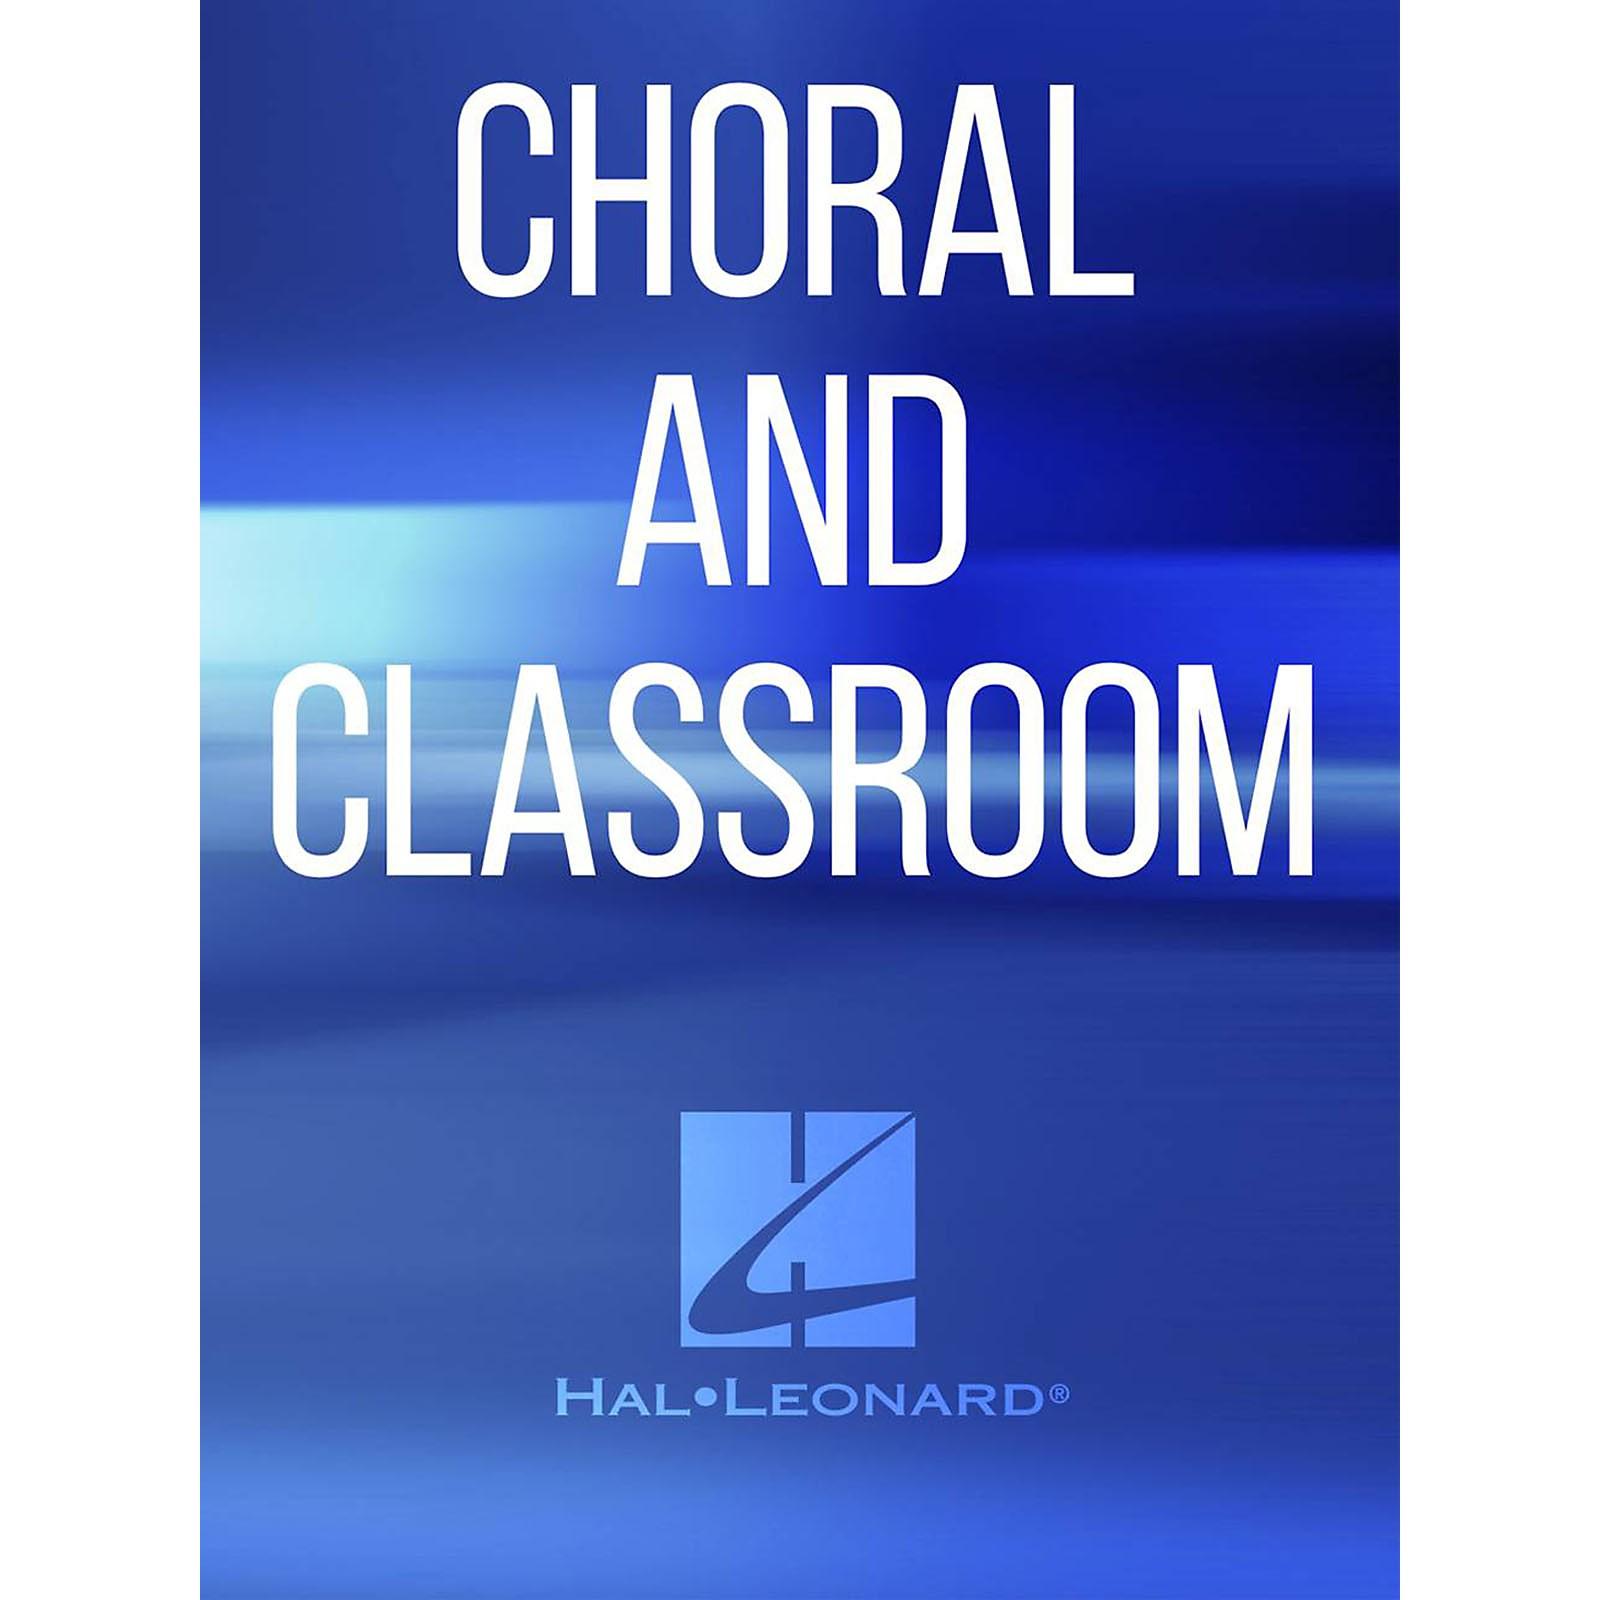 Hal Leonard Cinemagic! - Hollywood's Best Movie Music (Medley) ShowTrax CD Arranged by Mac Huff